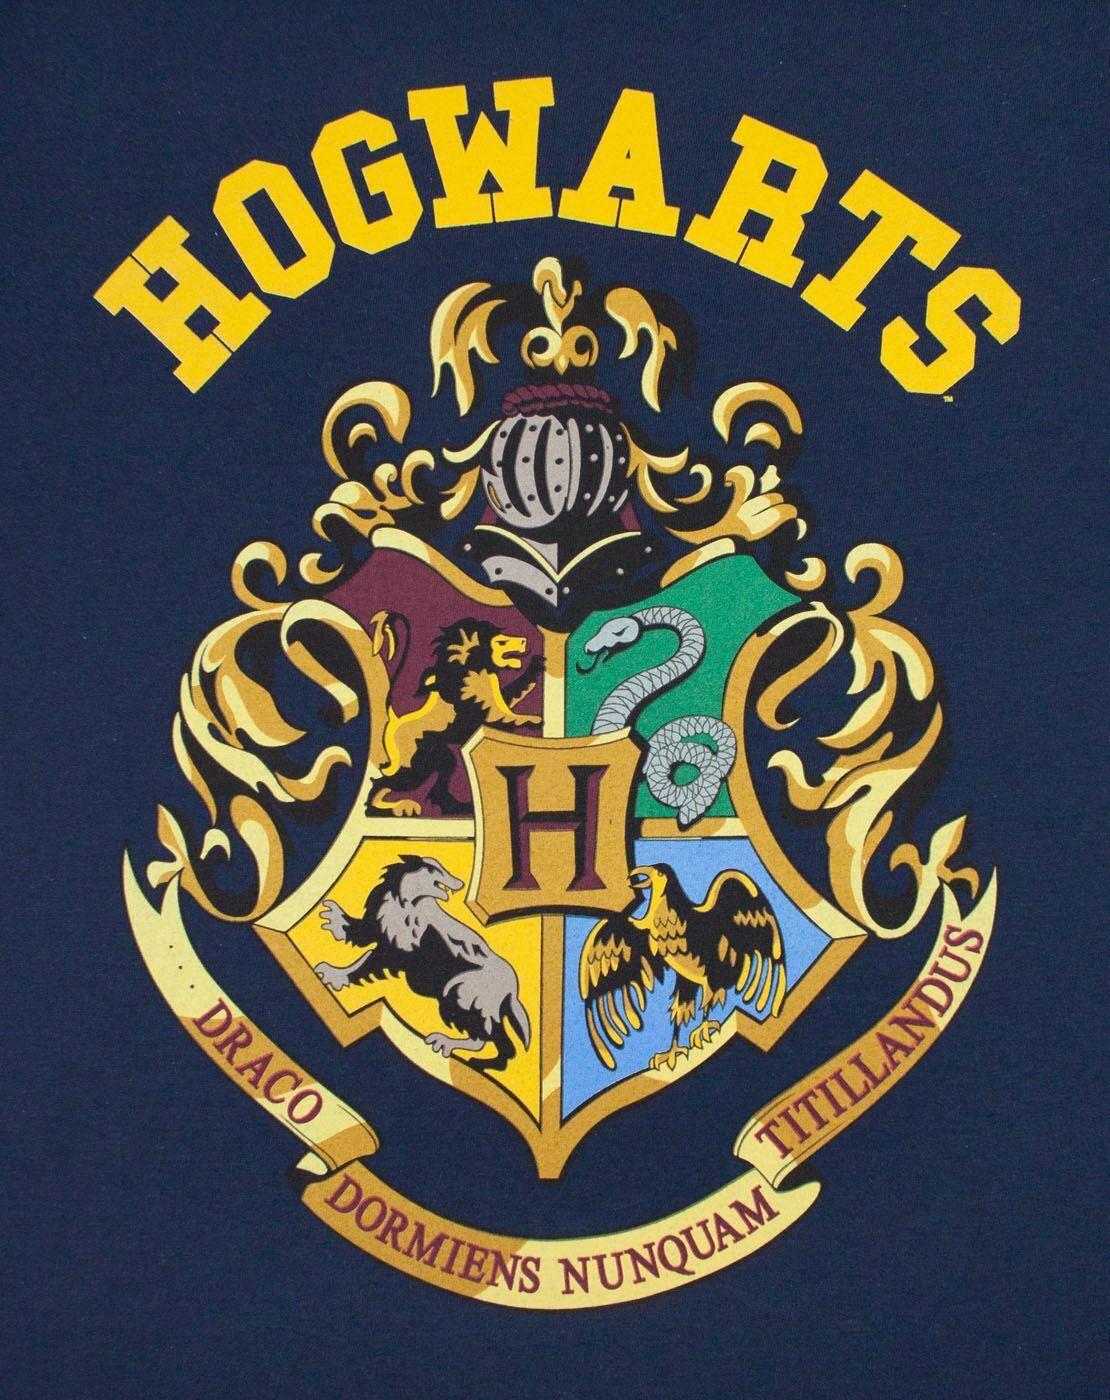 Harry-Potter-Hogwarts-Gryffindor-House-Crest-Women-039-s-Ladies-Navy-T-Shirt-Top thumbnail 7